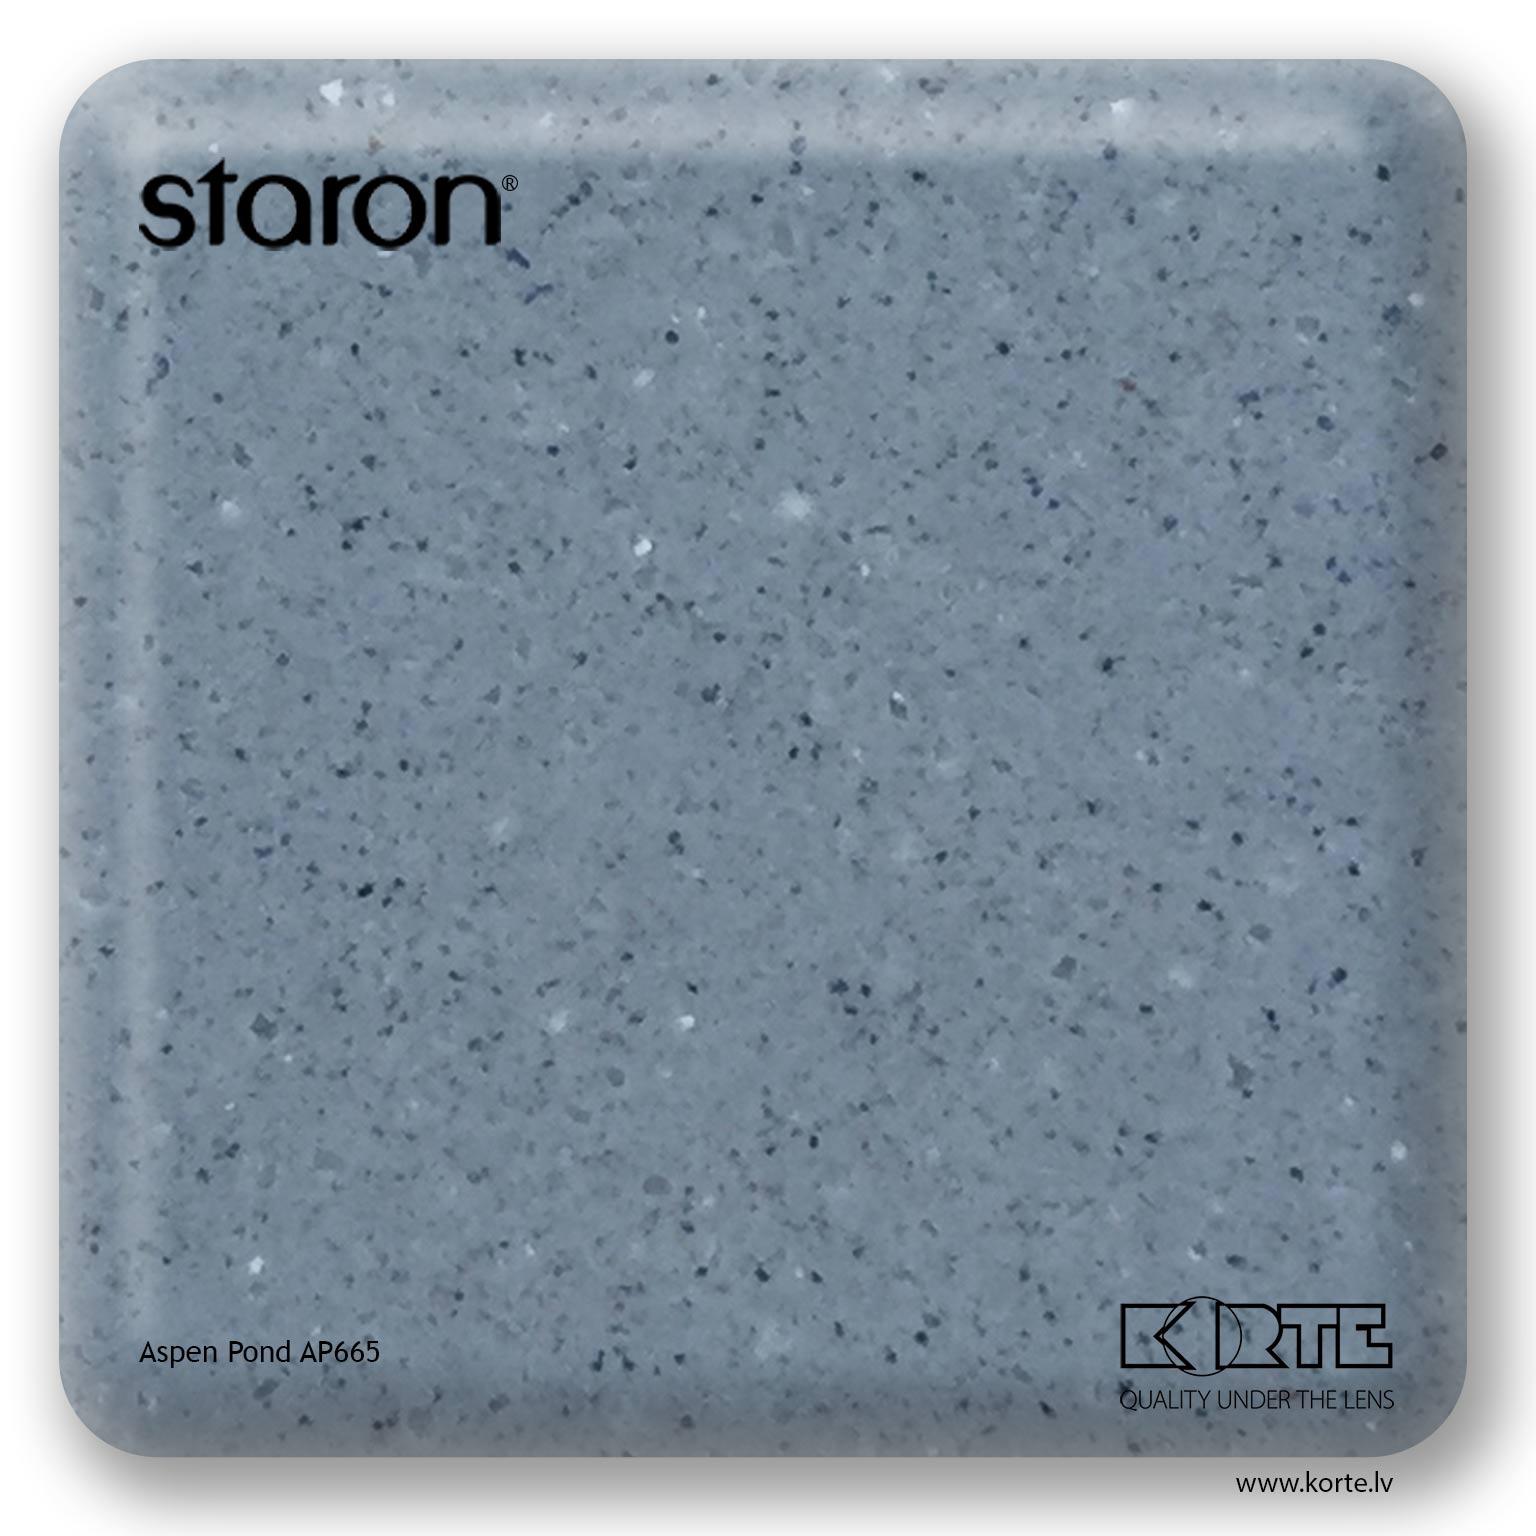 Staron Aspen Pond AP665